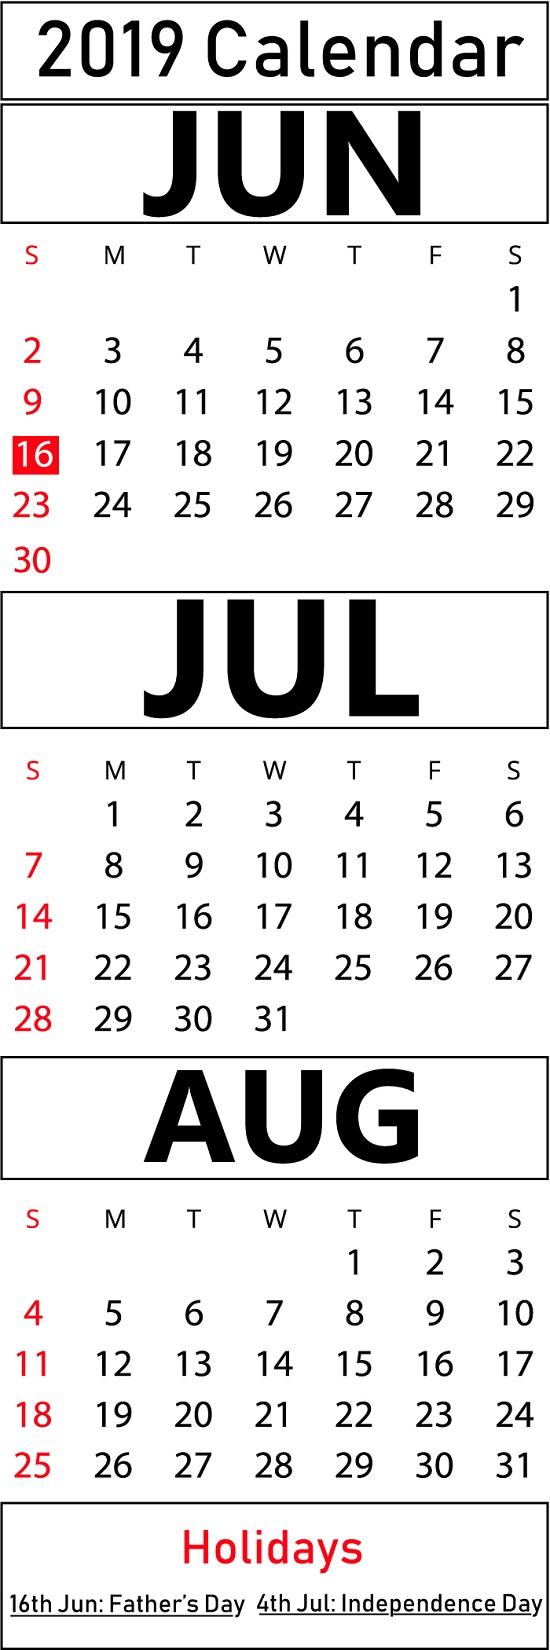 Printable June & July & August 2019 Calendar Templates   Printable inside Blank Calendar June July August